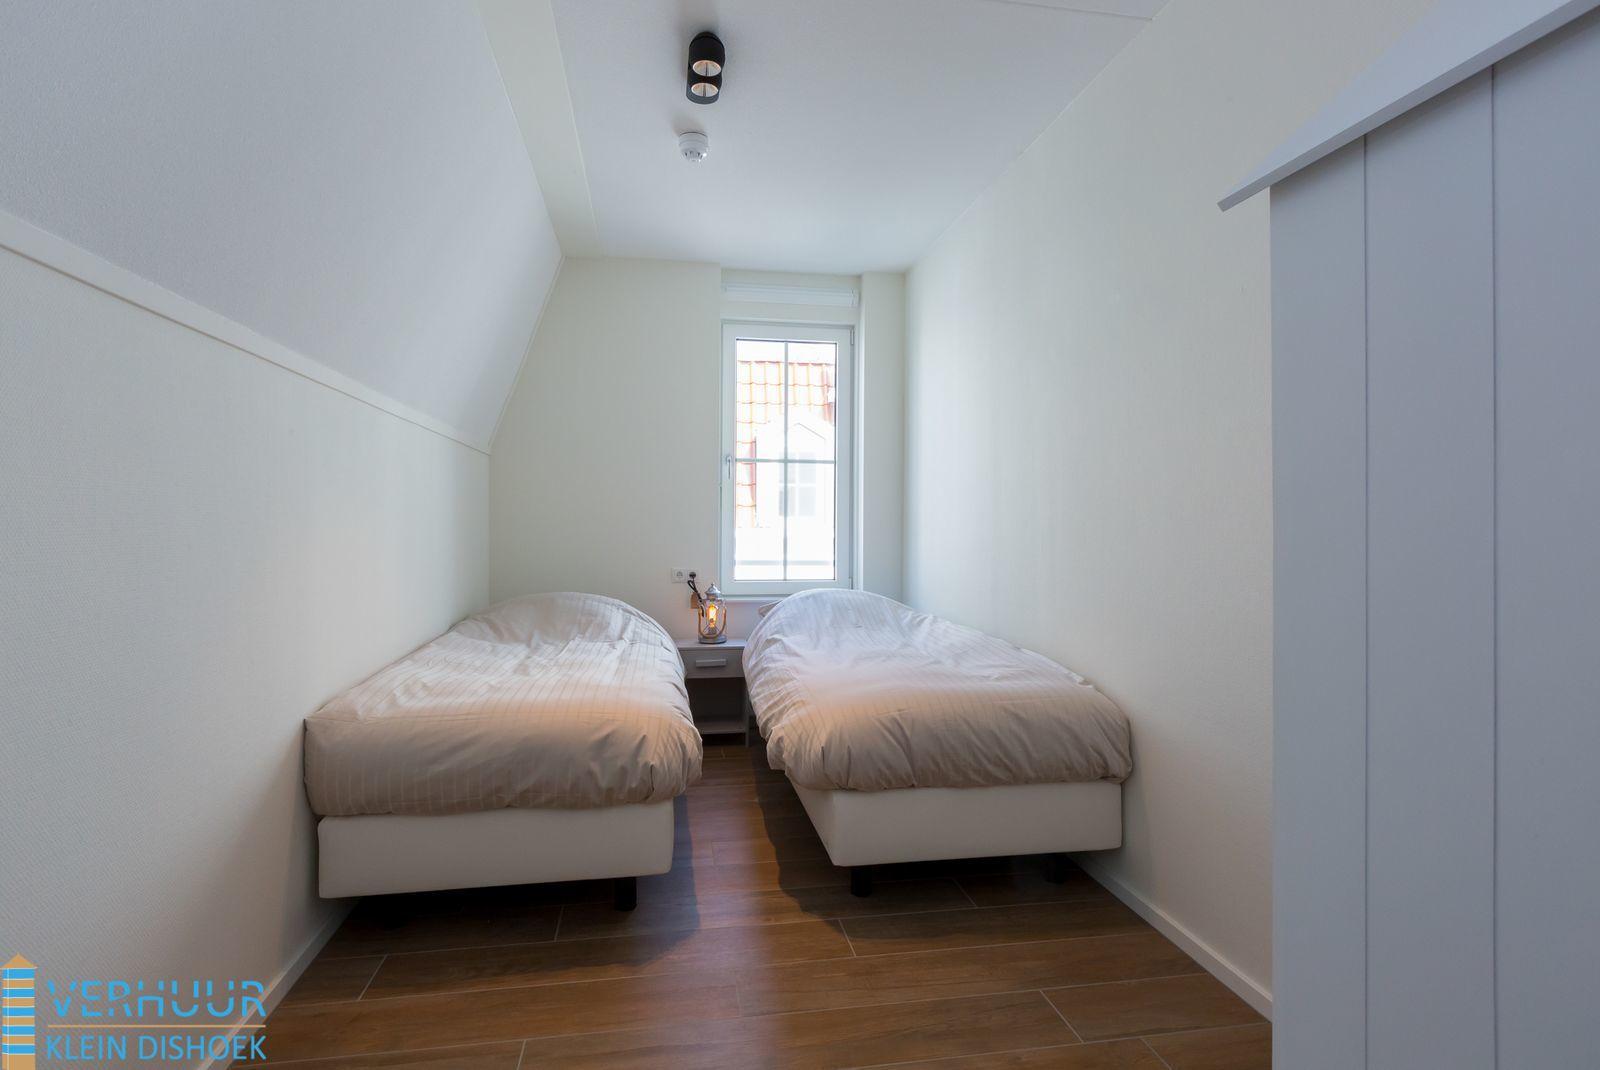 "Appartement - Kaapduinseweg 13 | Dishoek ""13N Luxe 6 personen"""